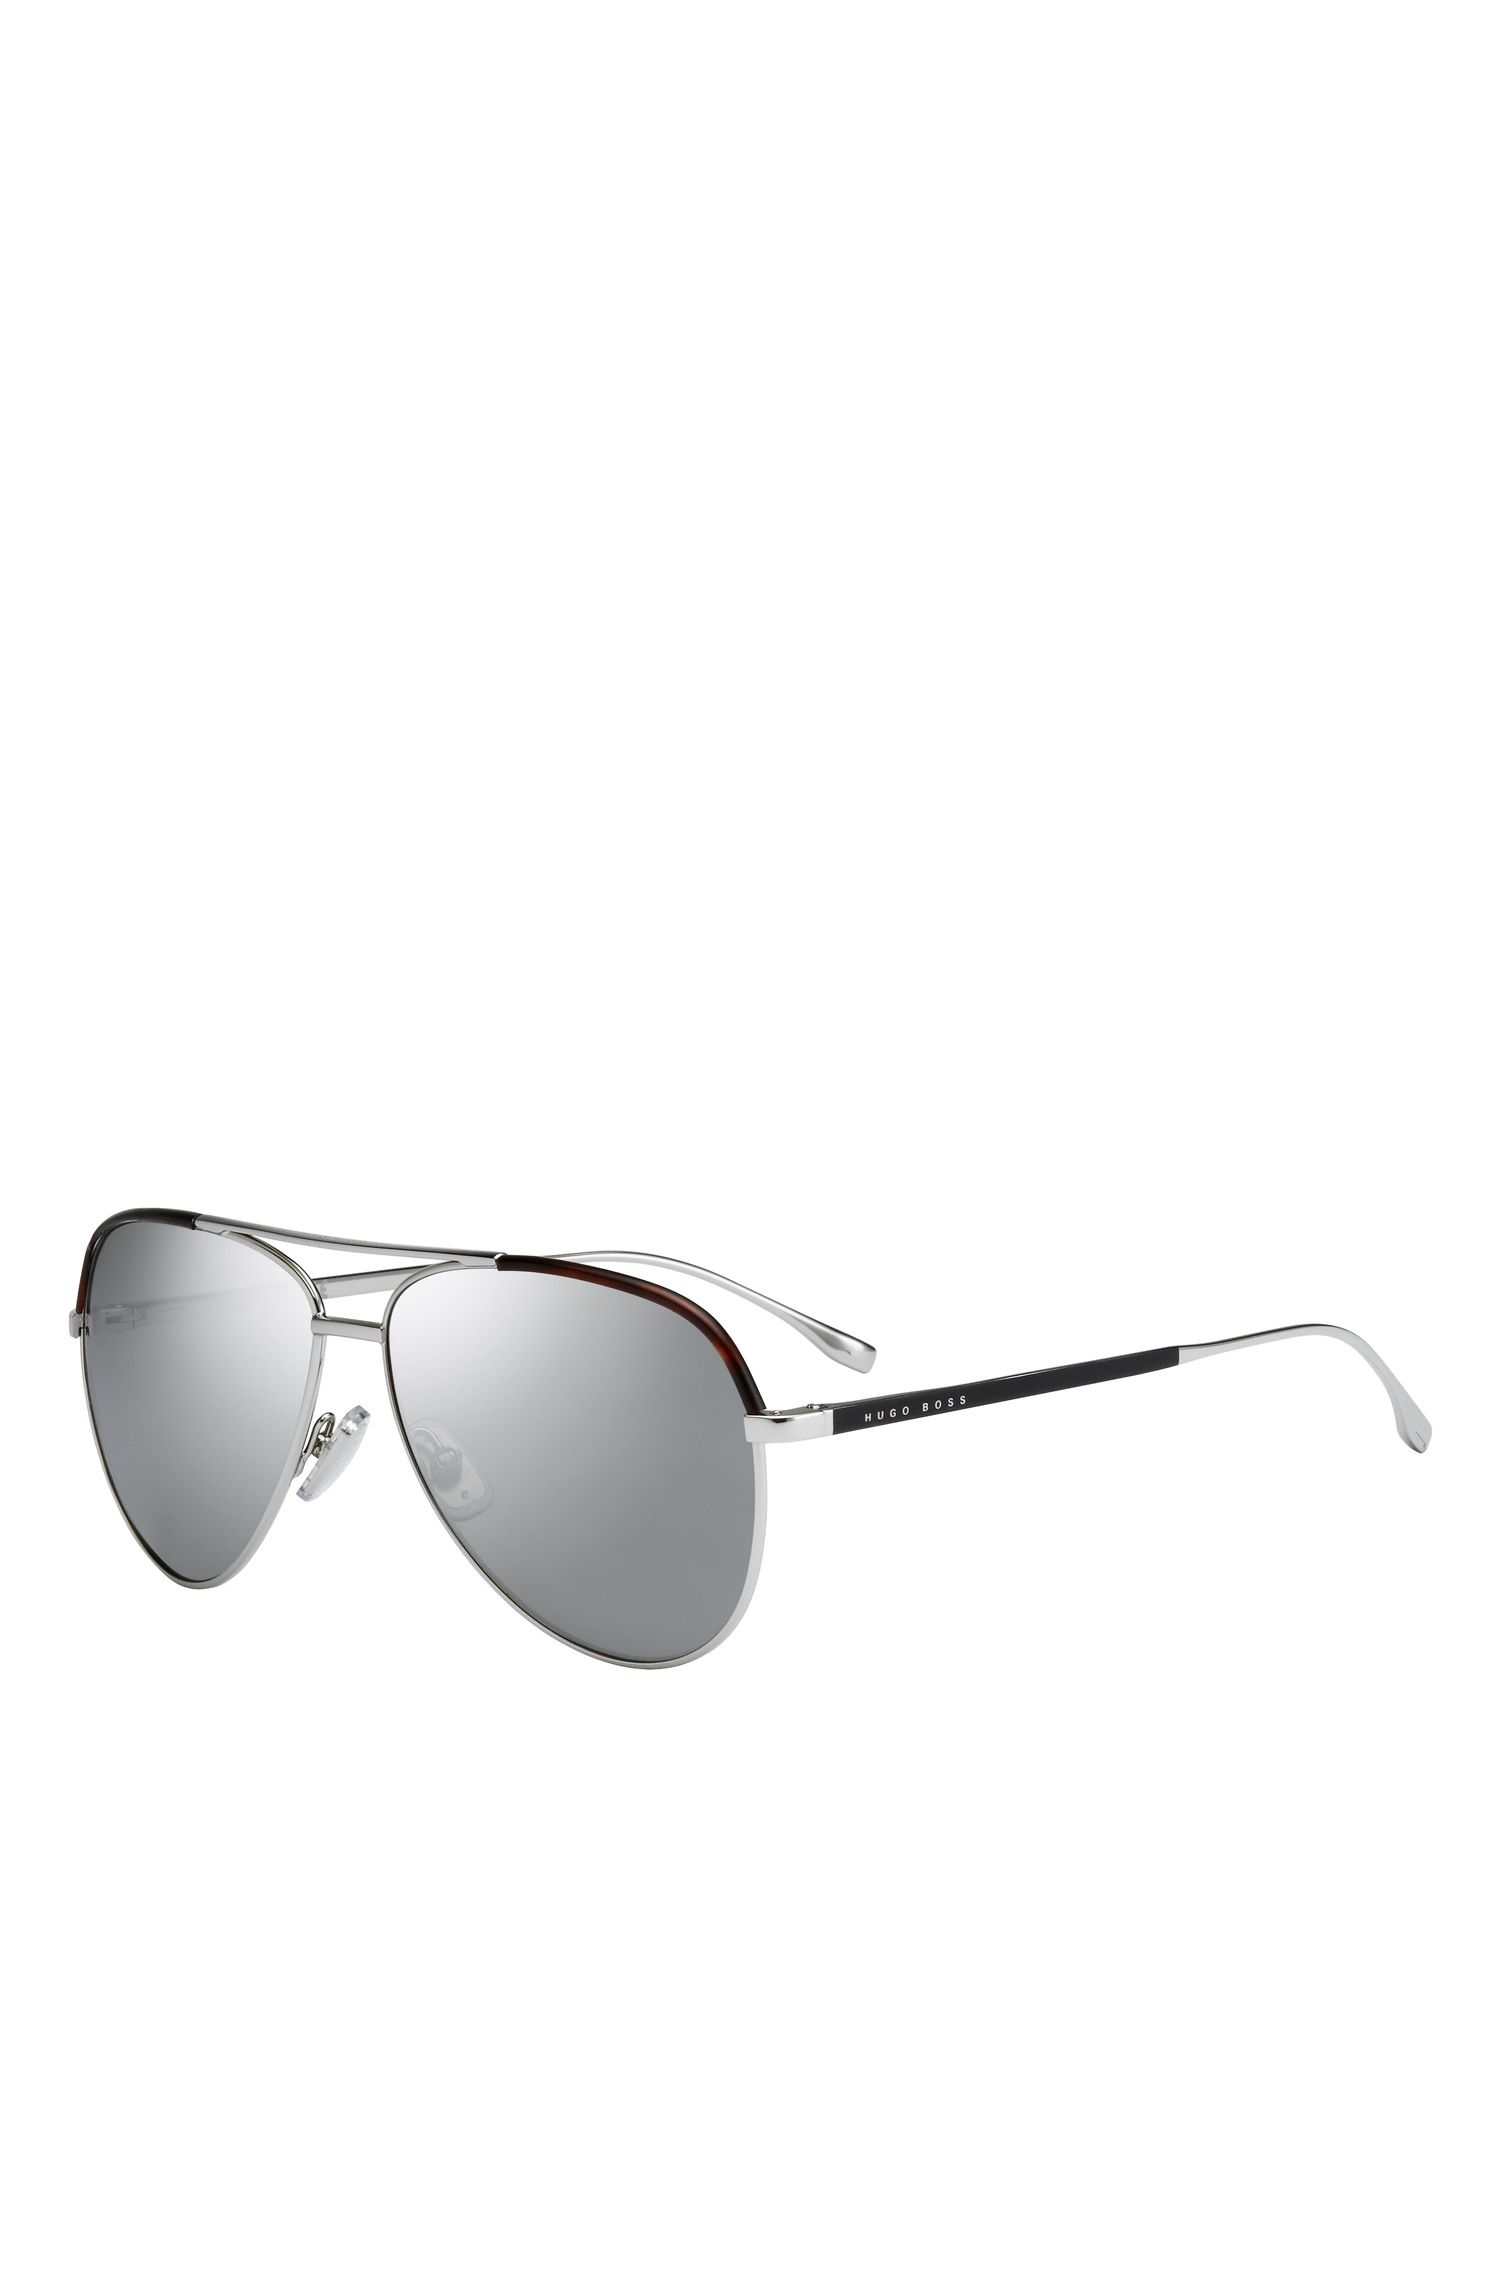 Sliver Mirror Lens Aviator Sunglasses | BOSS 0782S